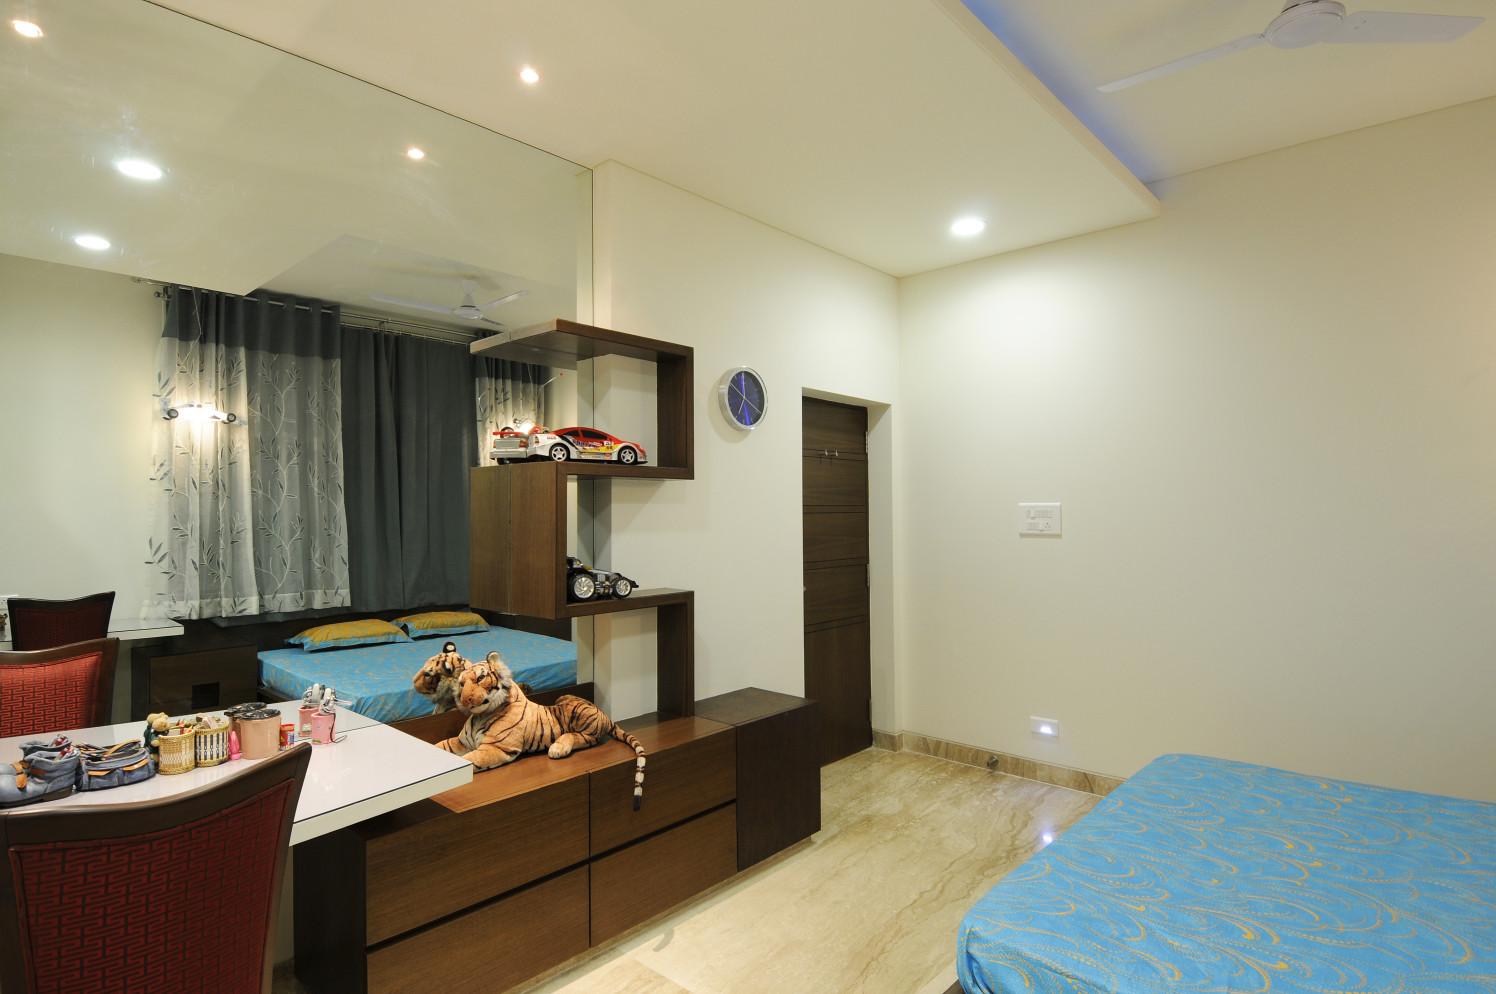 Bedroom With Pale Shade Interior by Nandigam Harish Bedroom Modern | Interior Design Photos & Ideas